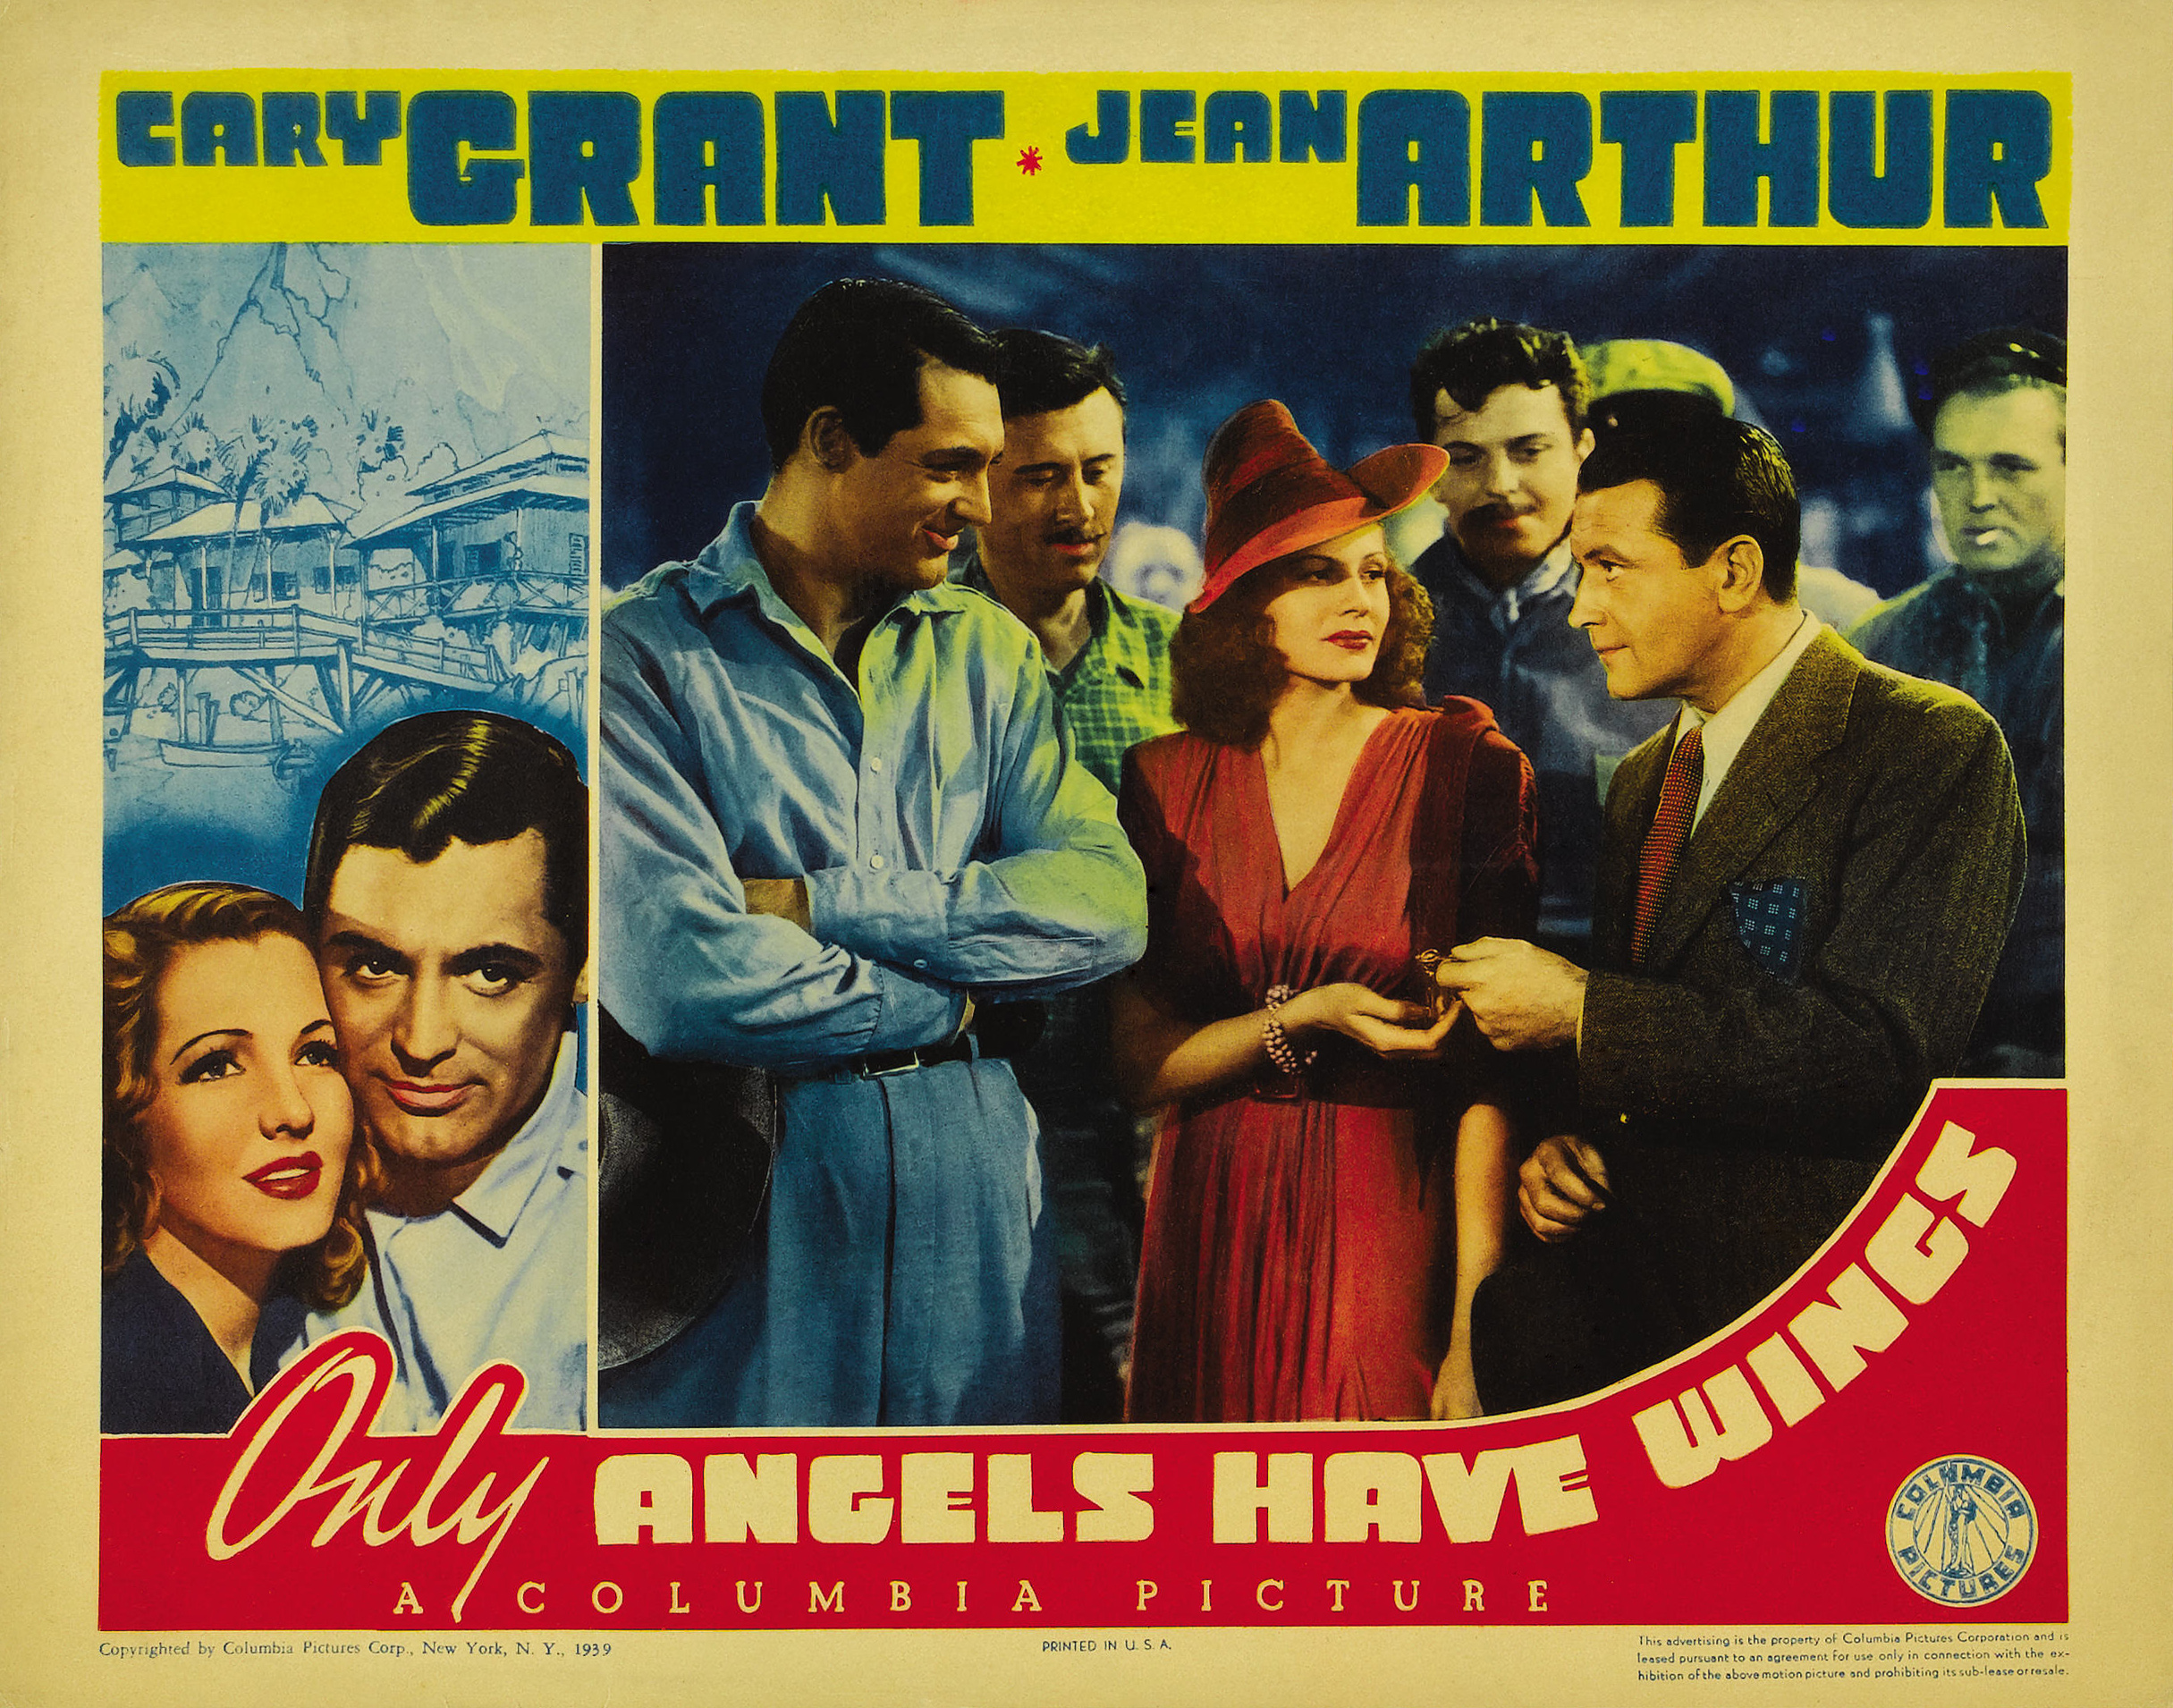 Cary Grant, Rita Hayworth, Jean Arthur, Richard Barthelmess, John Carroll, and Allyn Joslyn in Only Angels Have Wings (1939)